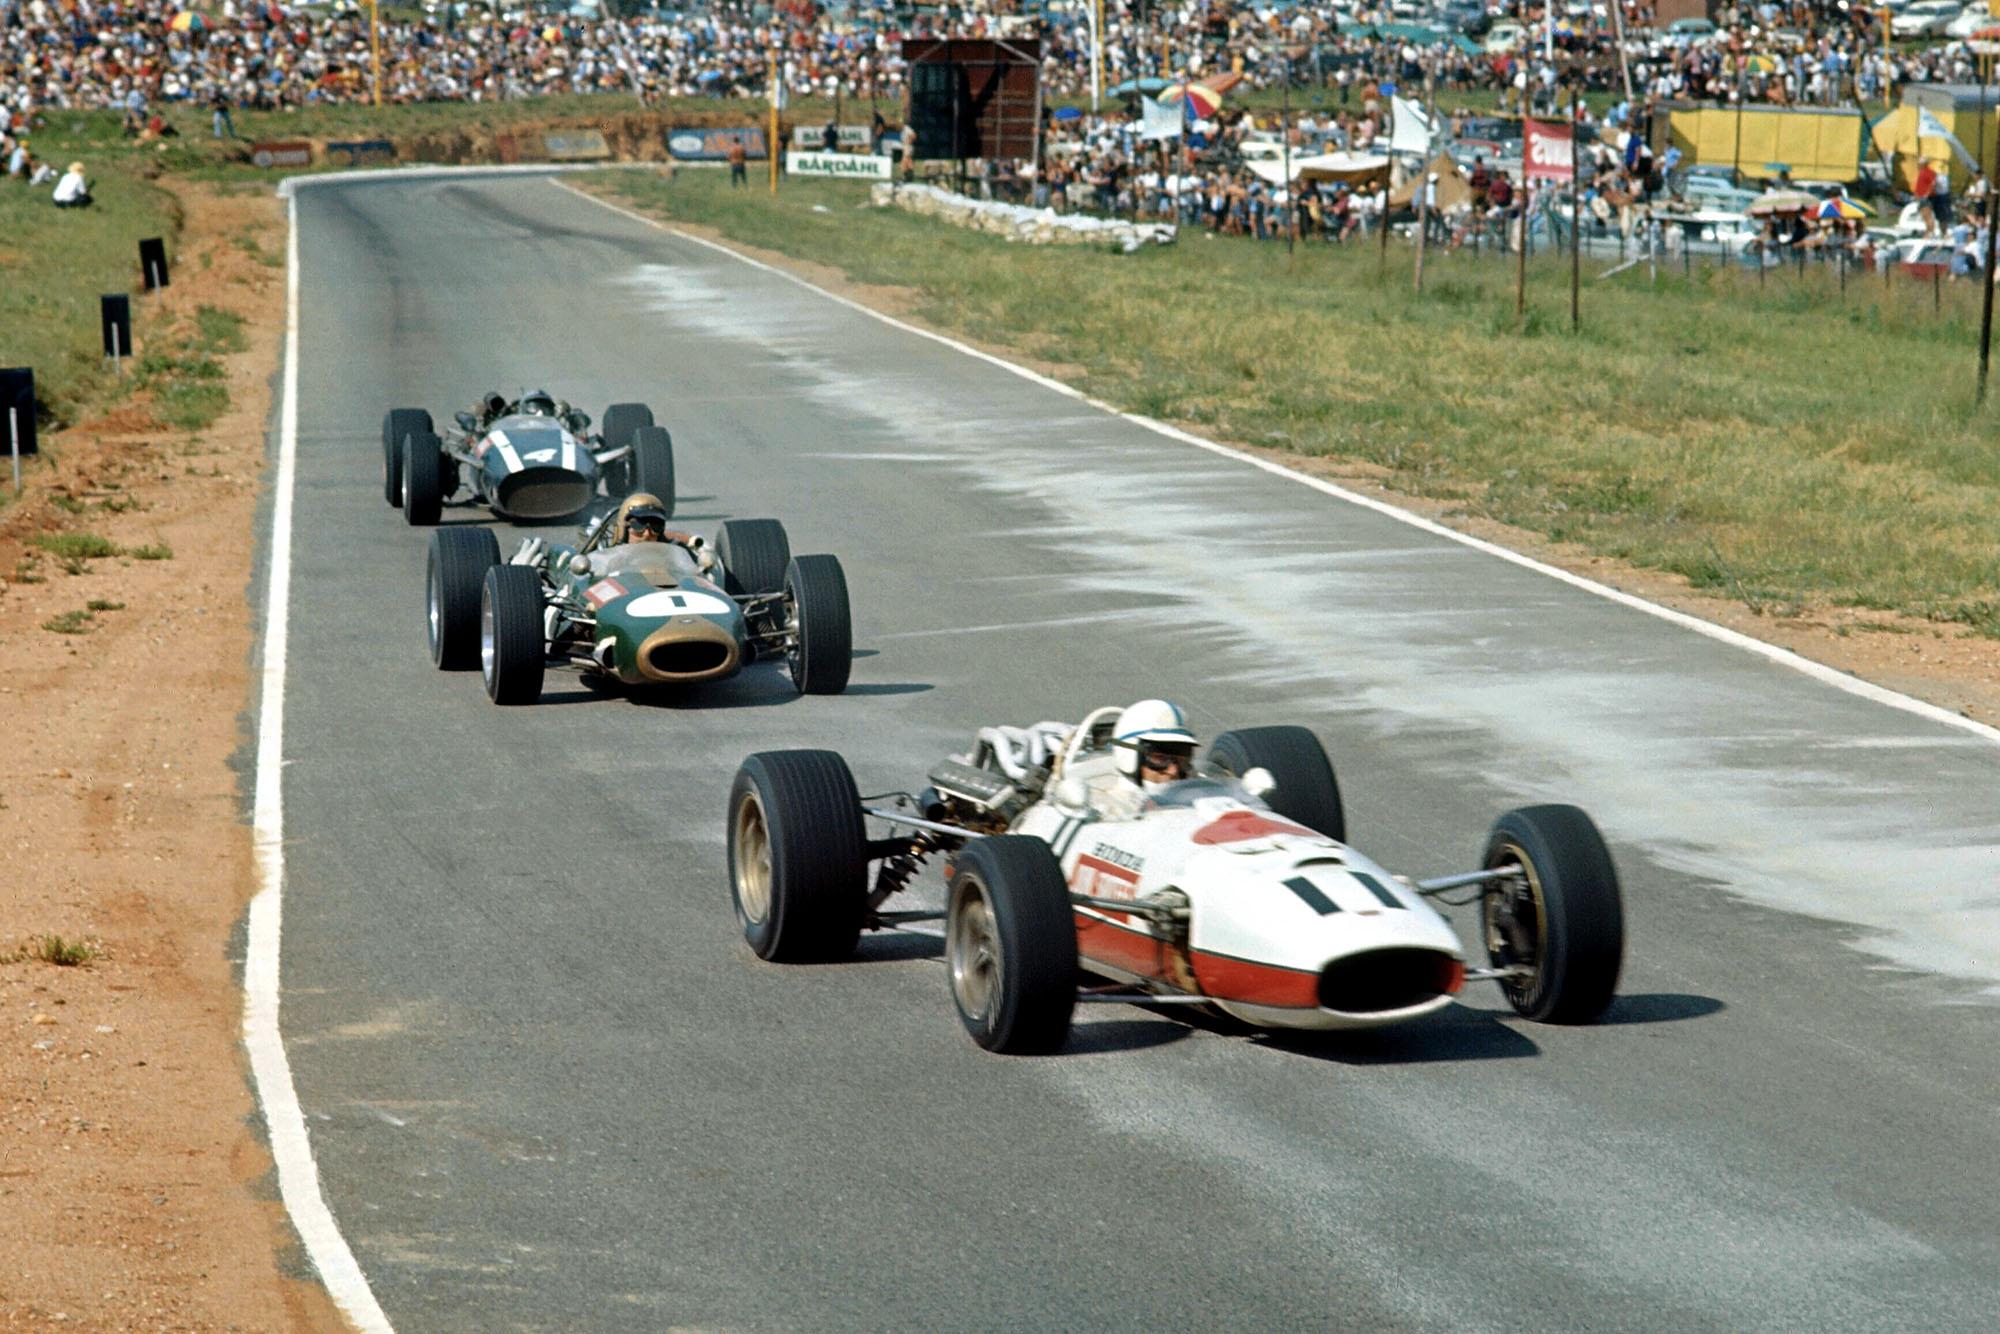 John Surtees (GBR) Honda RA273, leads Jack Brabham (AUS) Brabham Repco BT20, and eventual winner Pedro Rodriguez (MEX) Cooper Maserati T81.